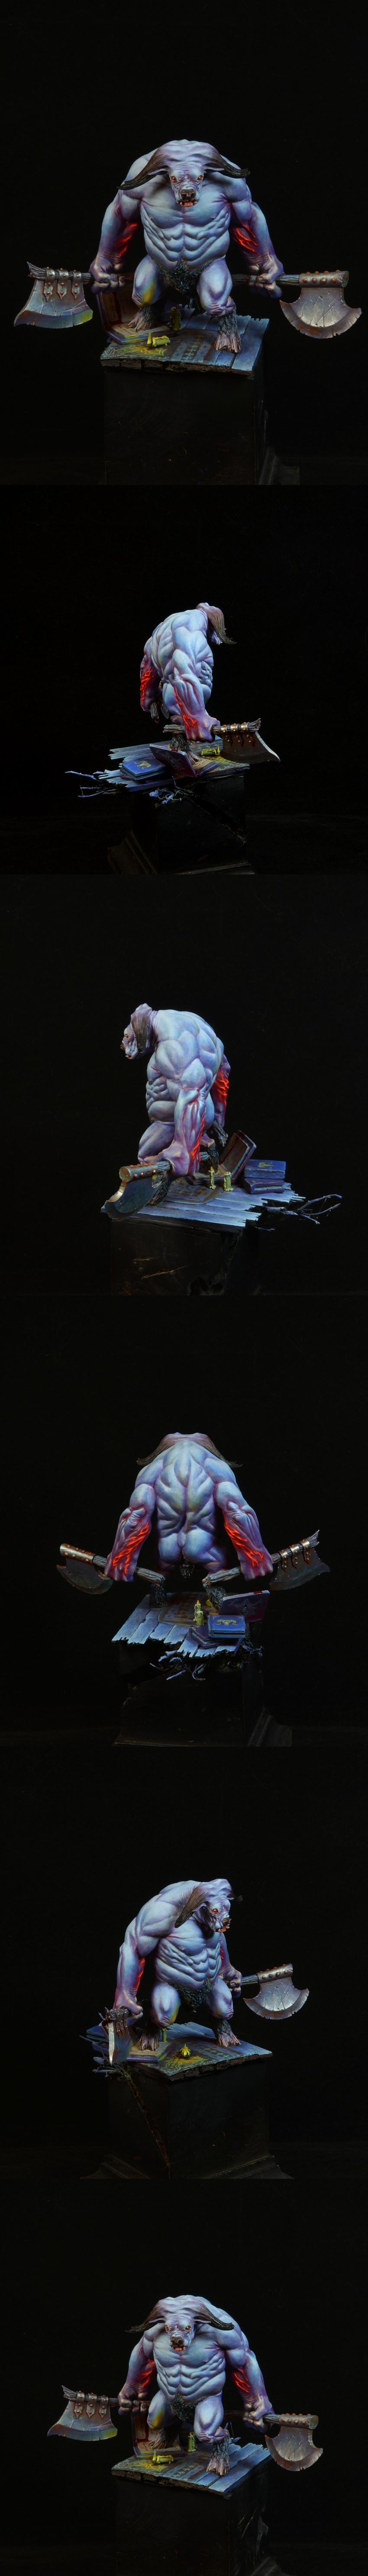 Lwpc2014-monster-minotaure